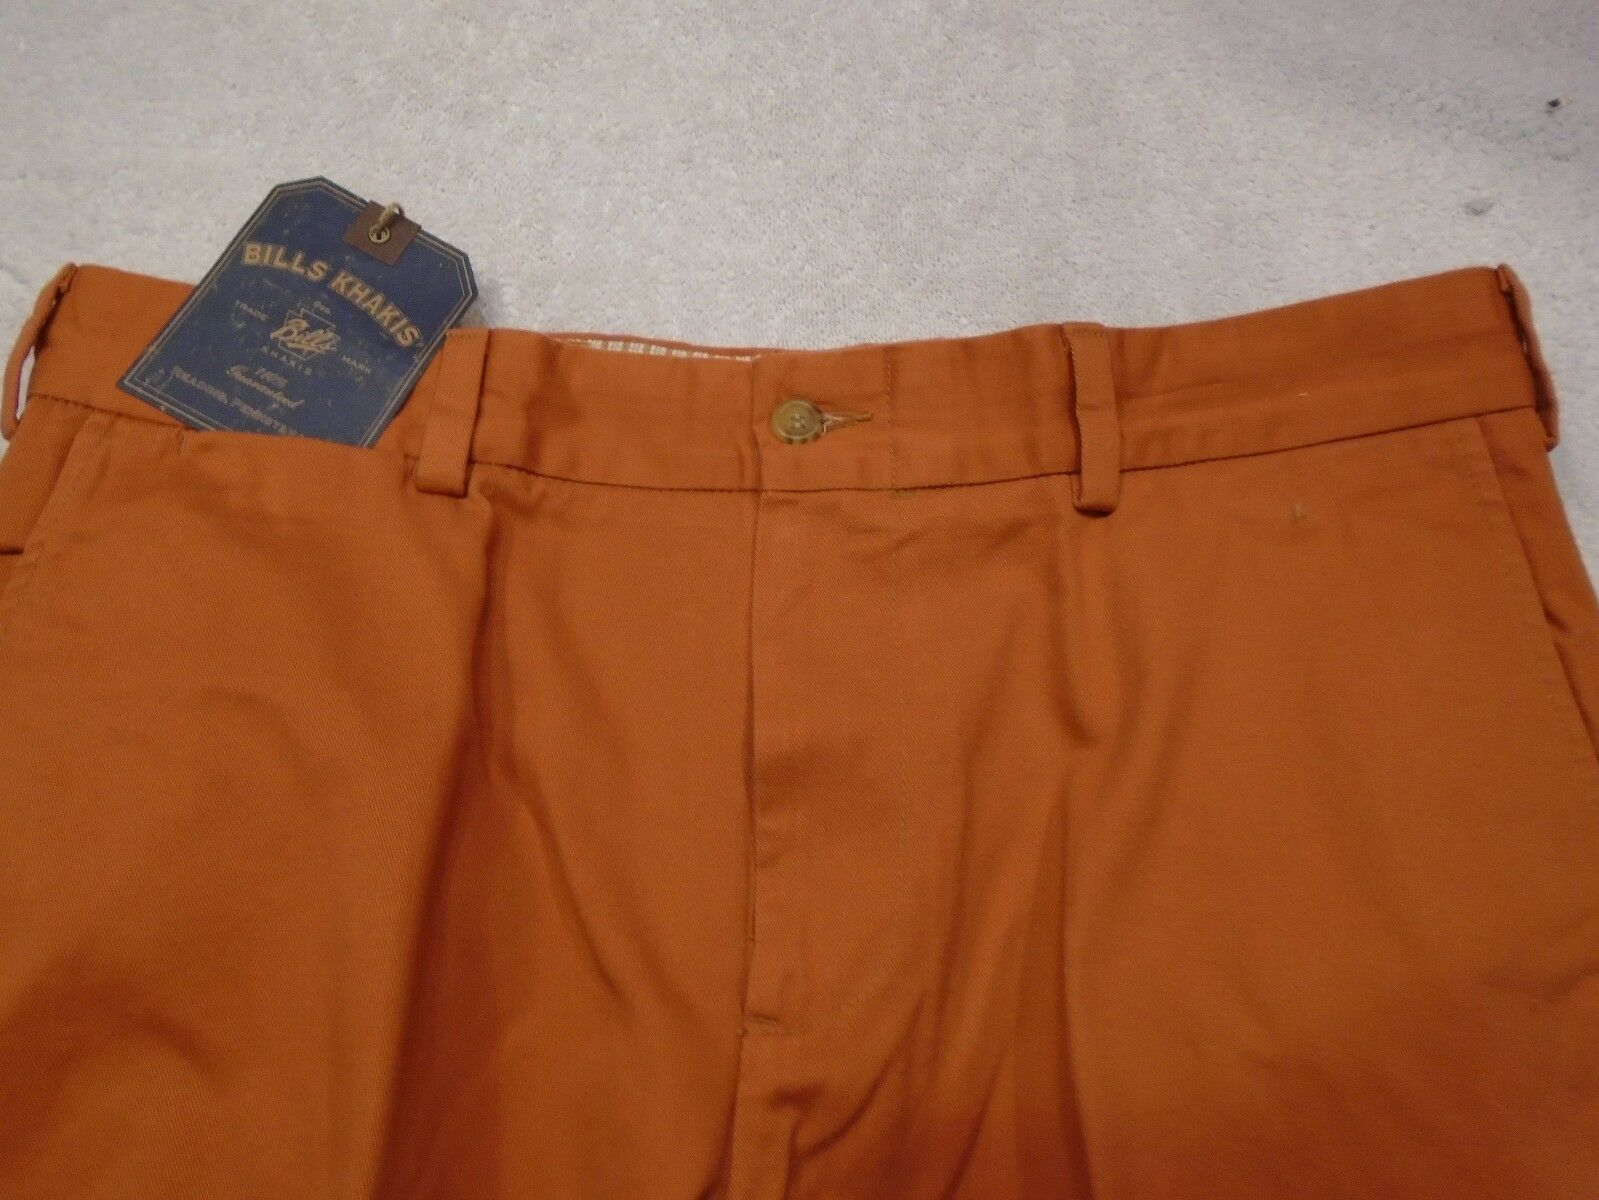 Bills Khakis Vintage Twill 100% Cotton Flat Front Pants NWT 35 x 32  M3